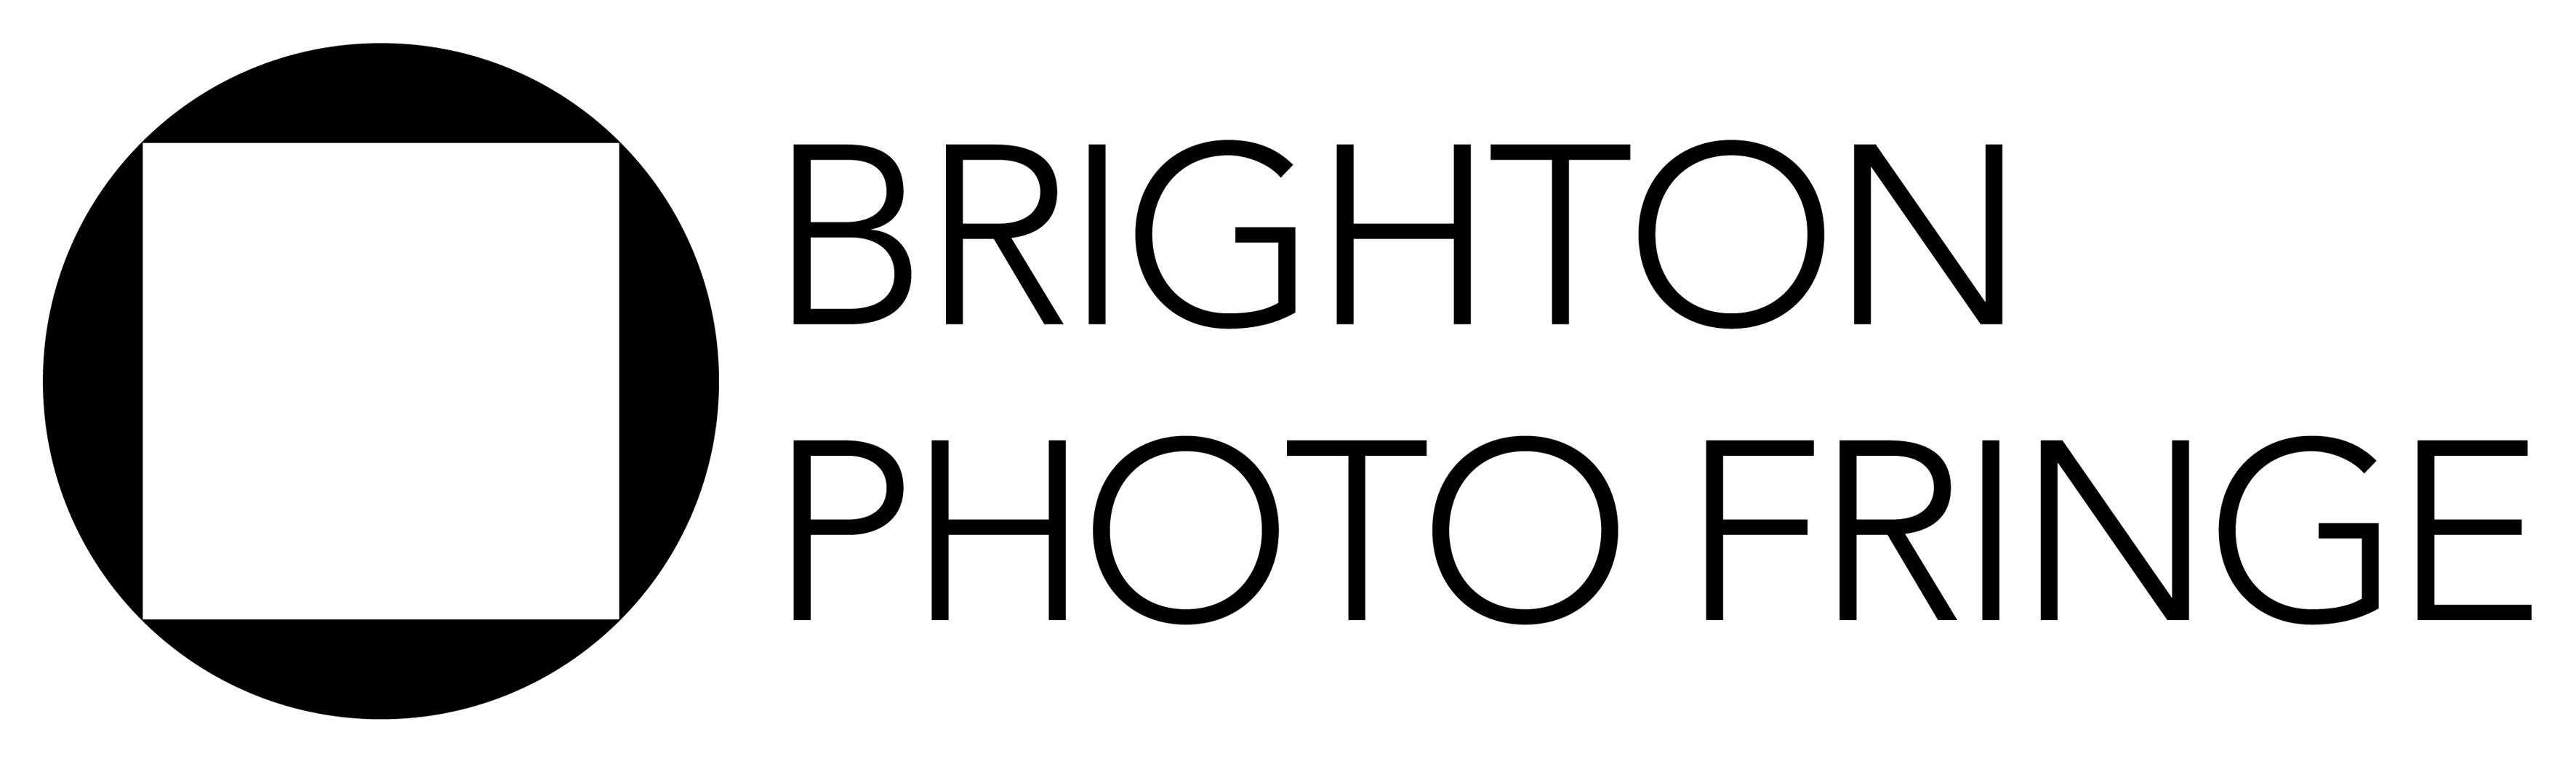 Brighton Photo Fringe logo 2010 - Amelia Shepherd   Amelia Shepherd